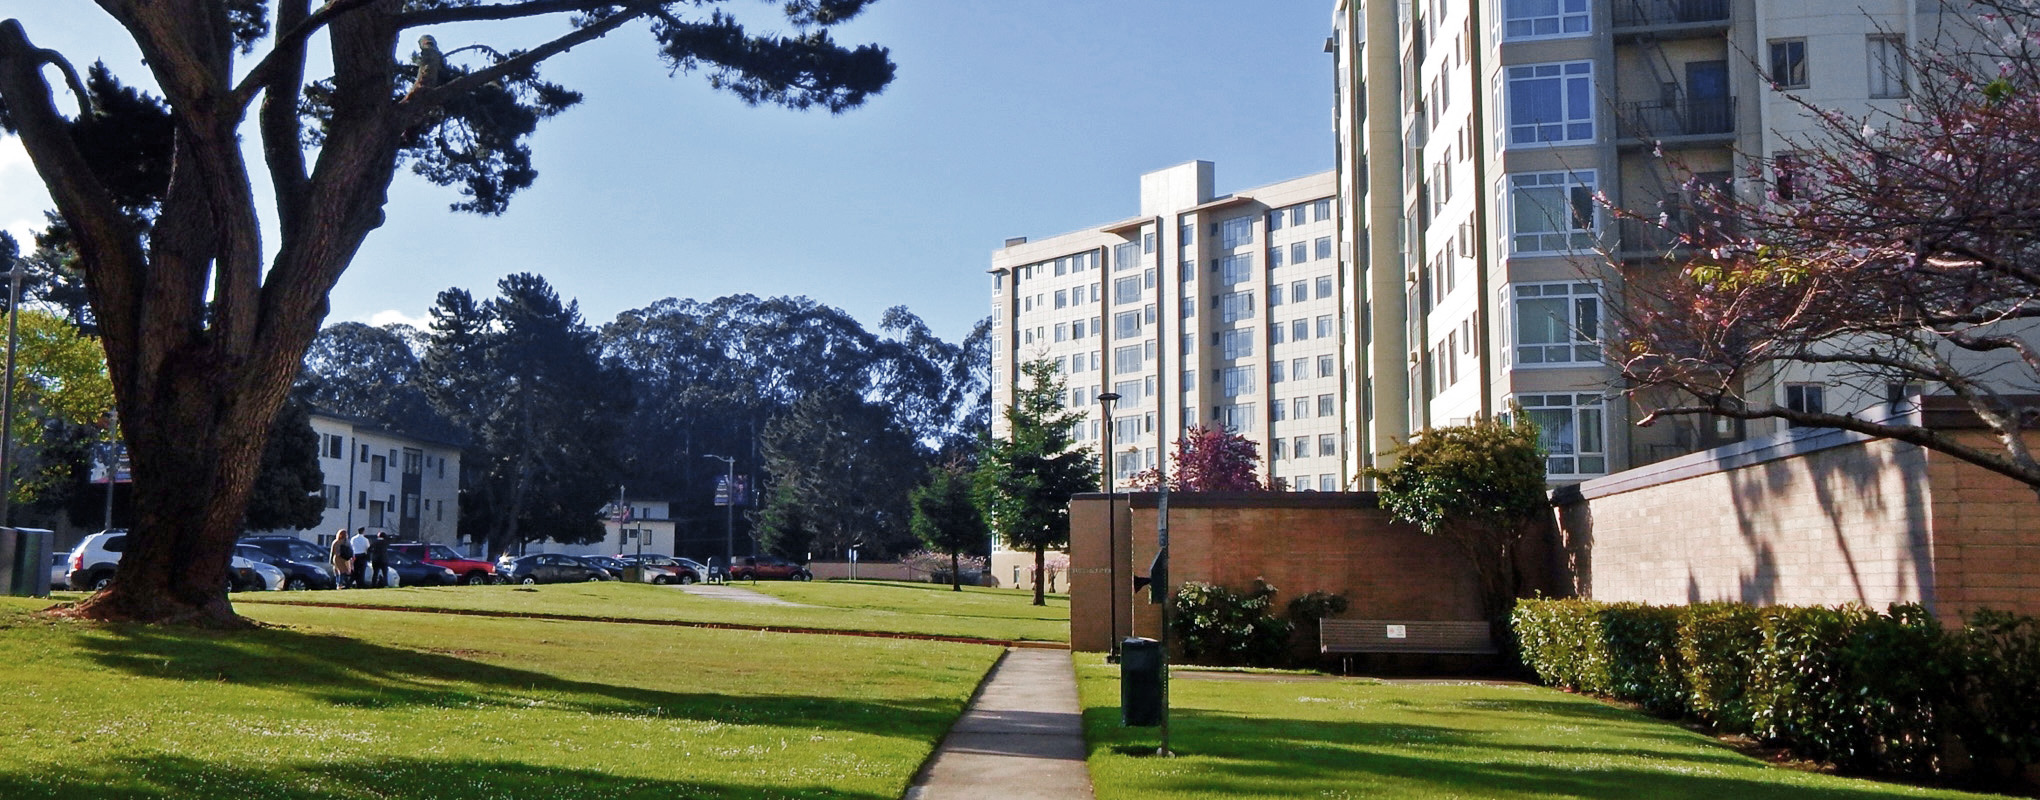 University Park North Apartments